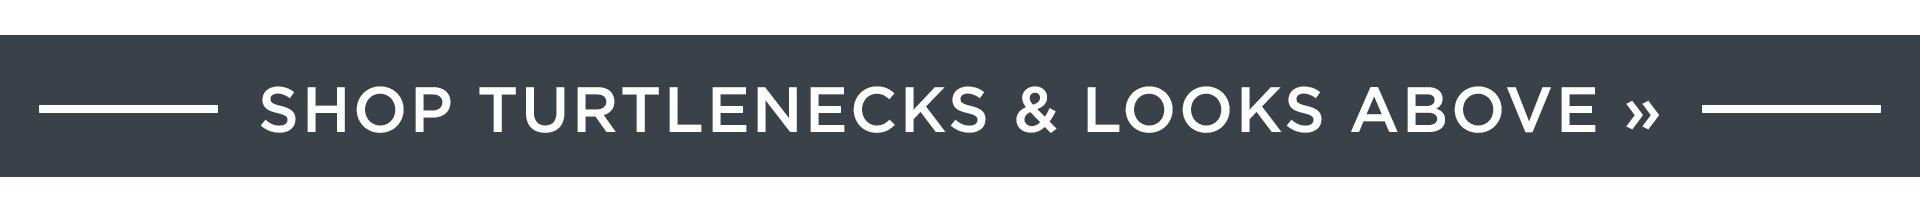 Shop Turtlenecks & Looks Above